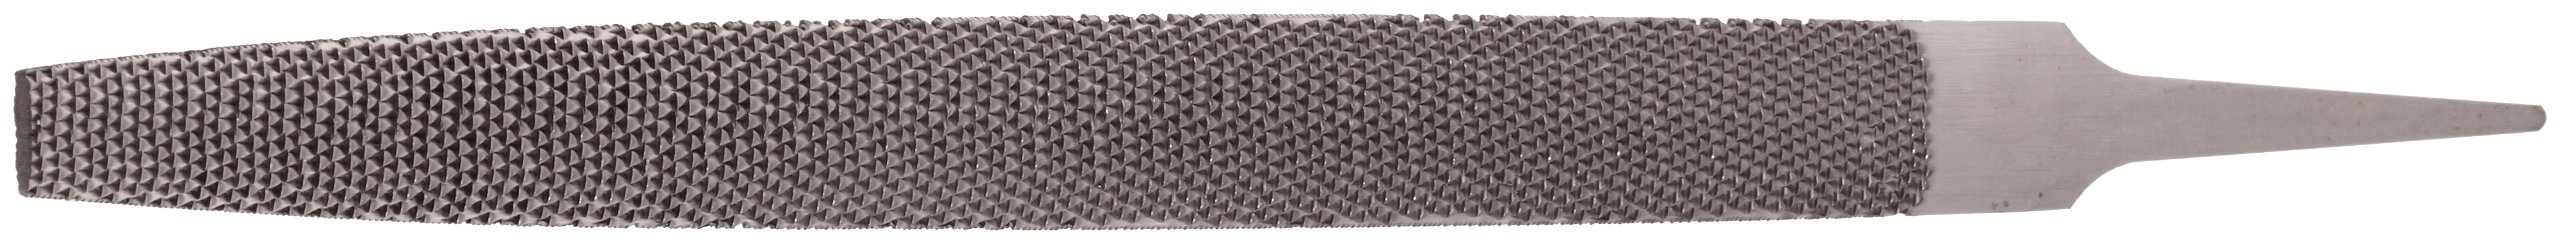 Nicholson Hand File, American Pattern, Rasp Cut, Half-Round, Medium, 10'' Length, Narrow